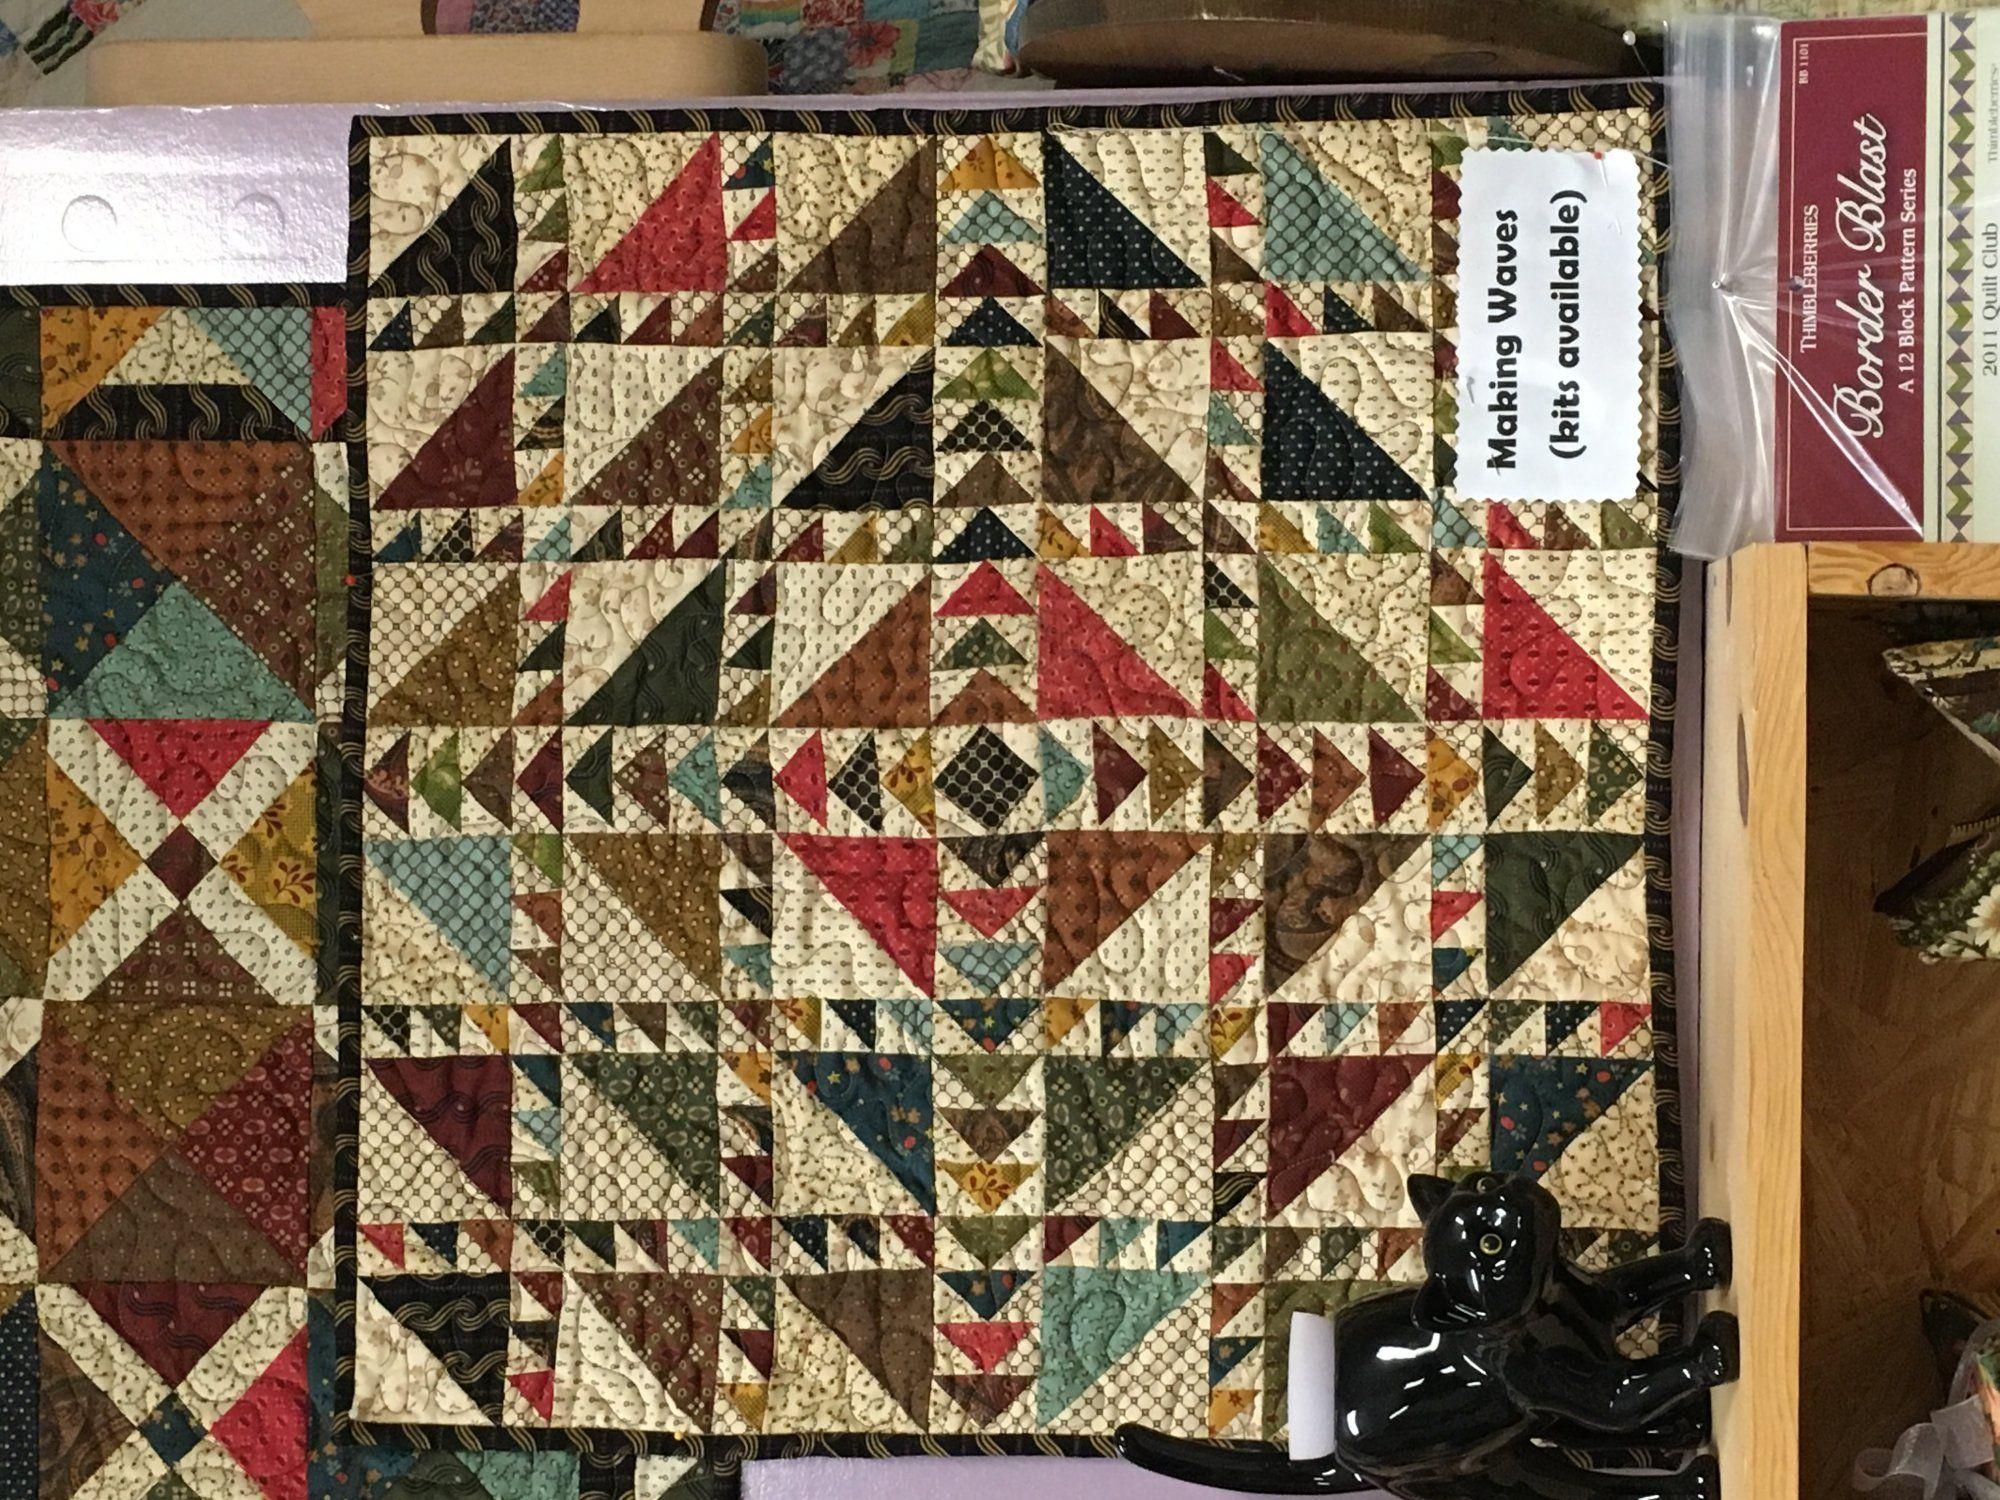 Simple Whatnots #6 miniature quilt kits | Quilts | Pinterest ... : miniature quilt kits - Adamdwight.com